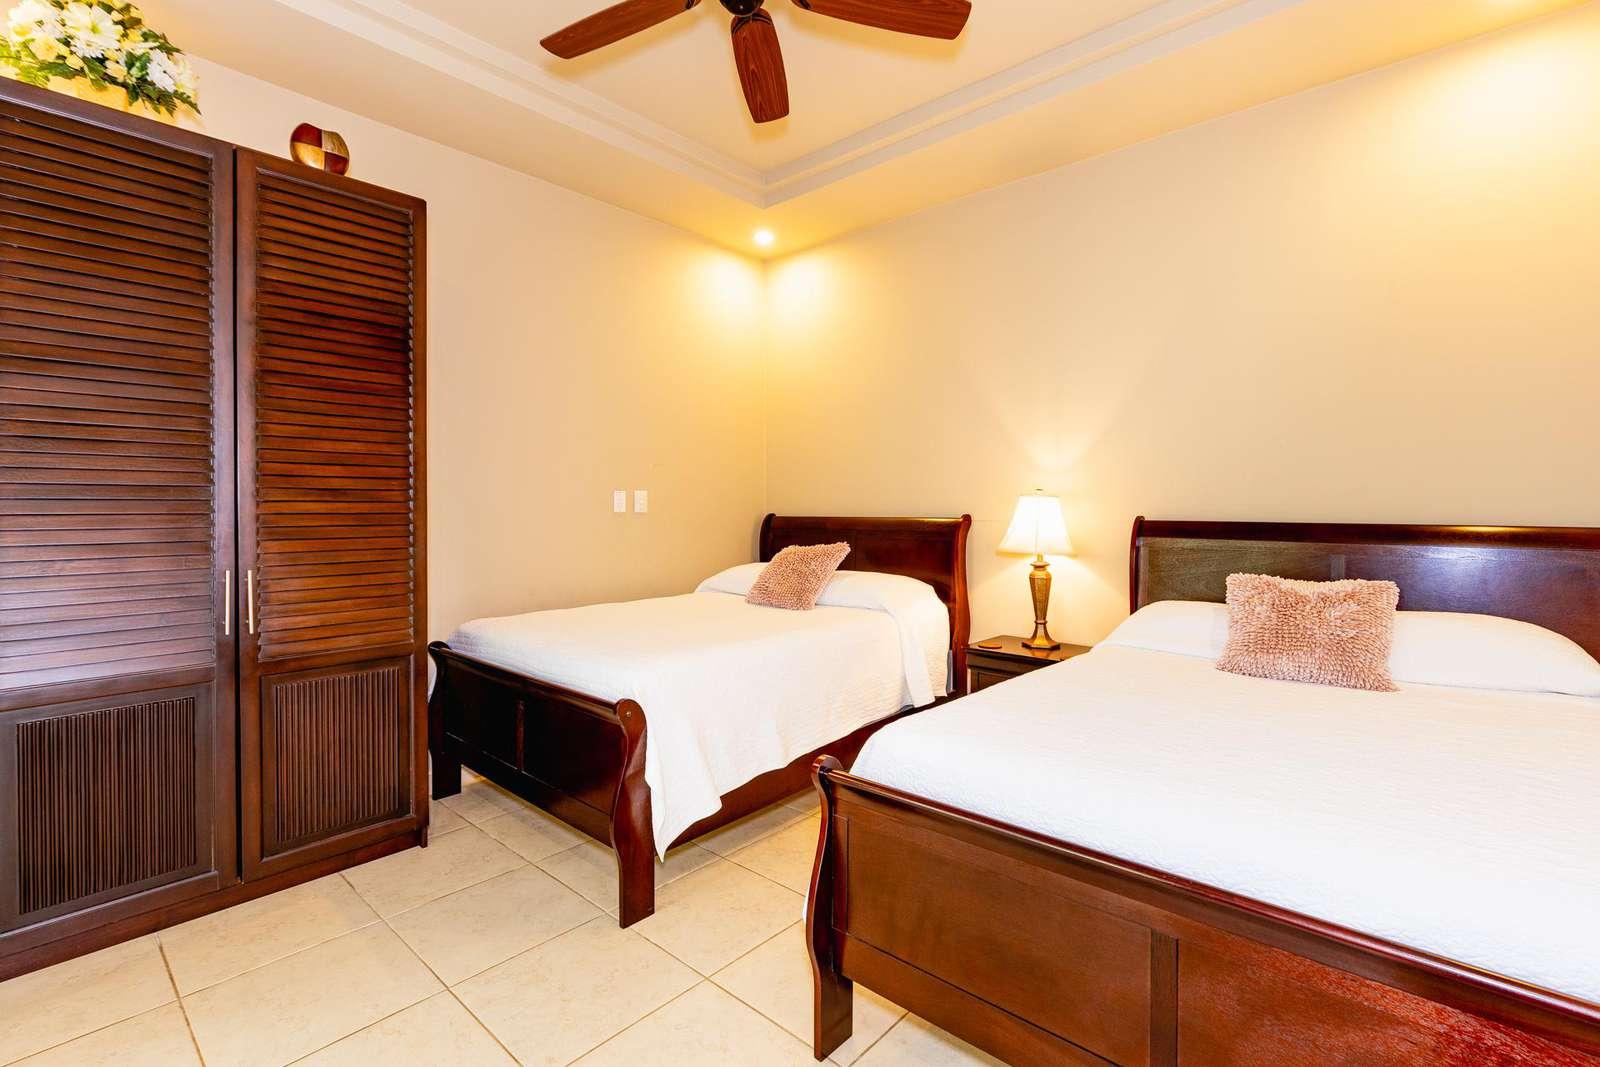 Guest bedroom, two queen beds, private bathroom